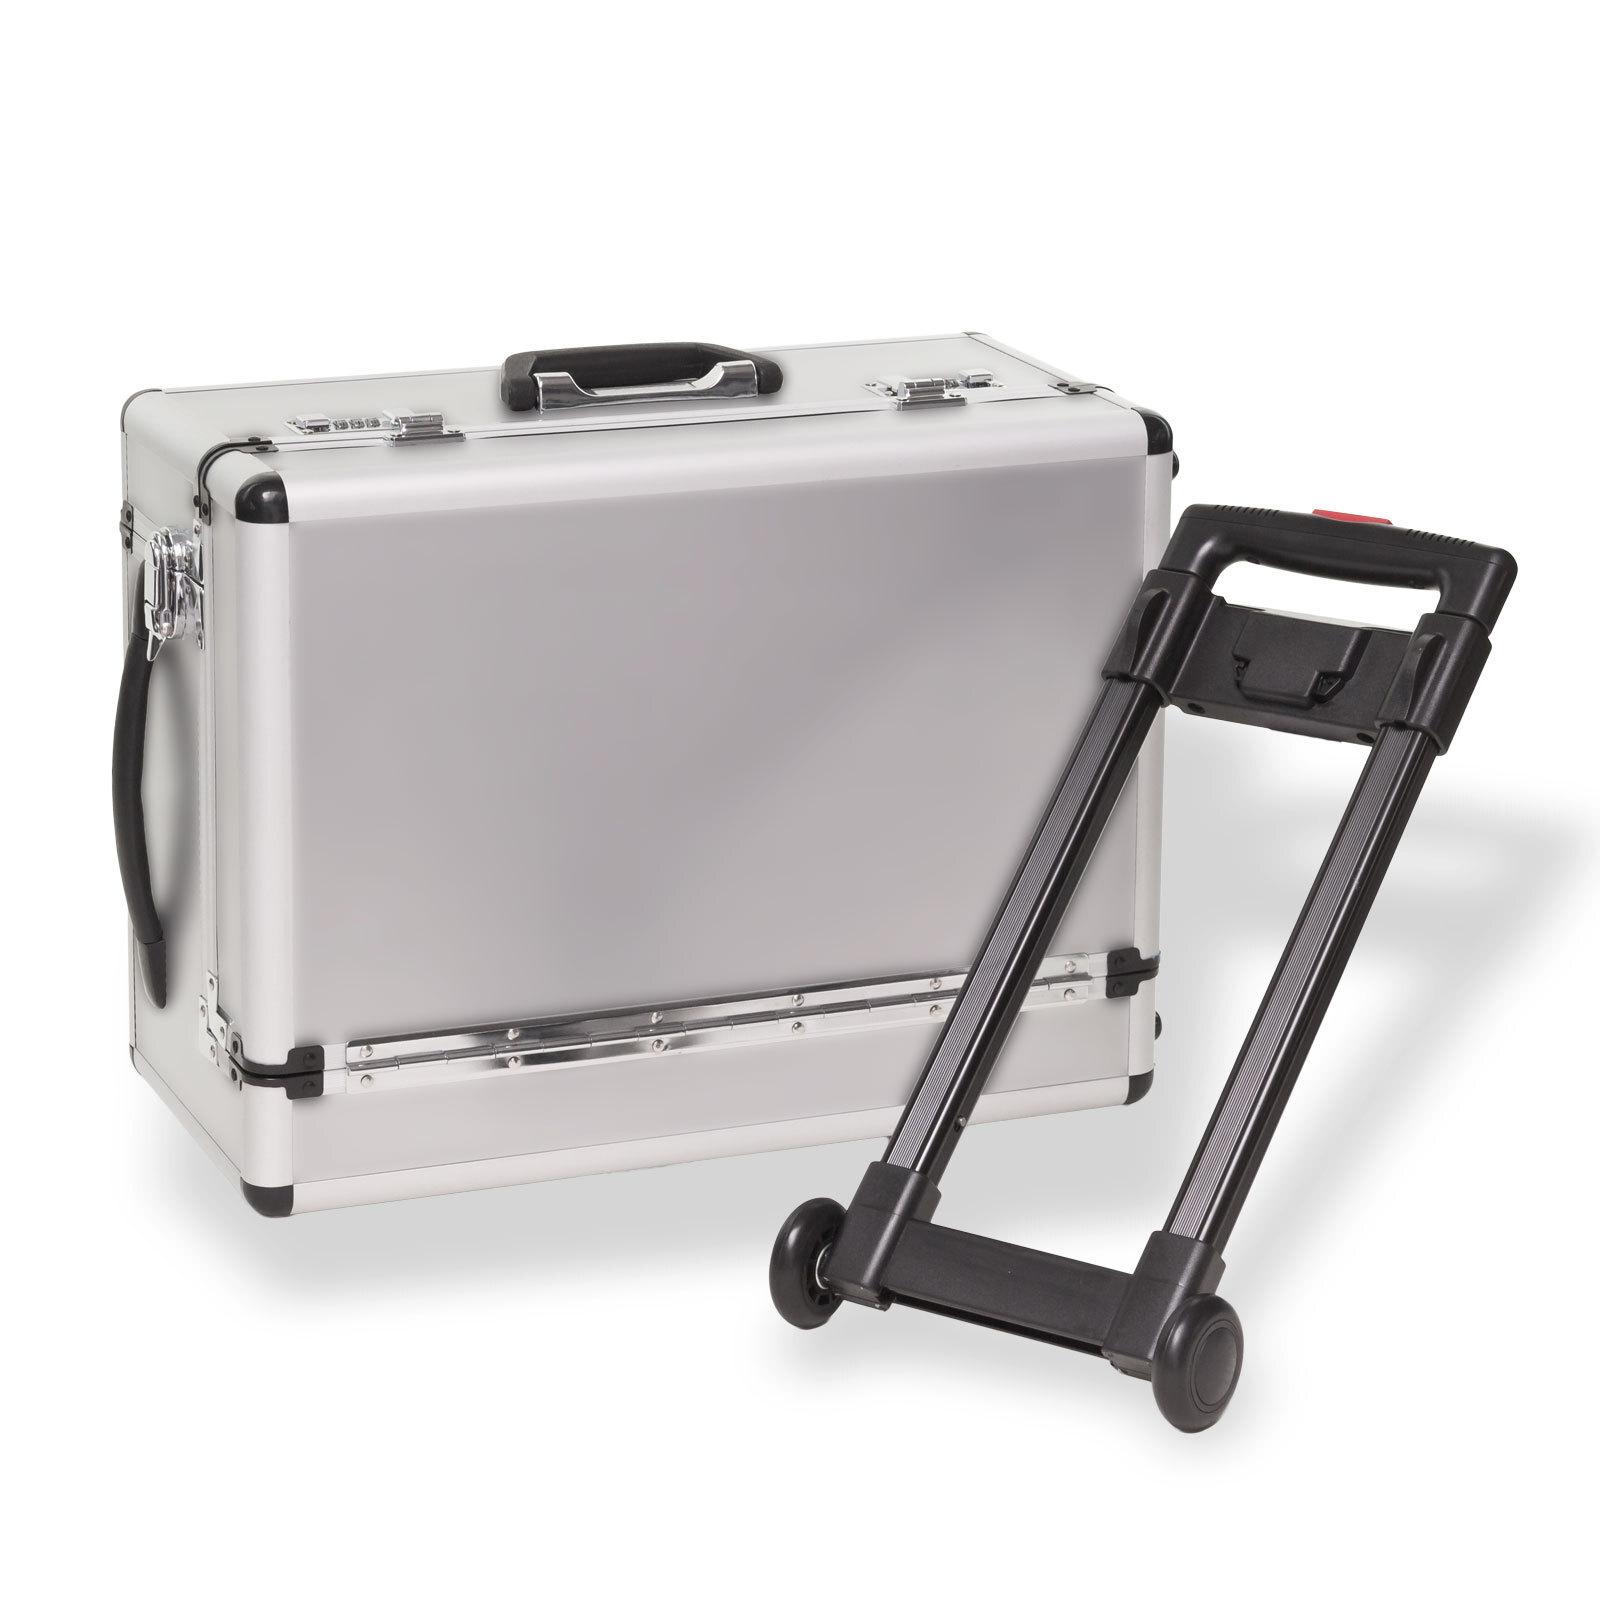 alu koffer trolley alutrolley handgep ck pilotenkoffer silber 49 5x25x37 cm ebay. Black Bedroom Furniture Sets. Home Design Ideas